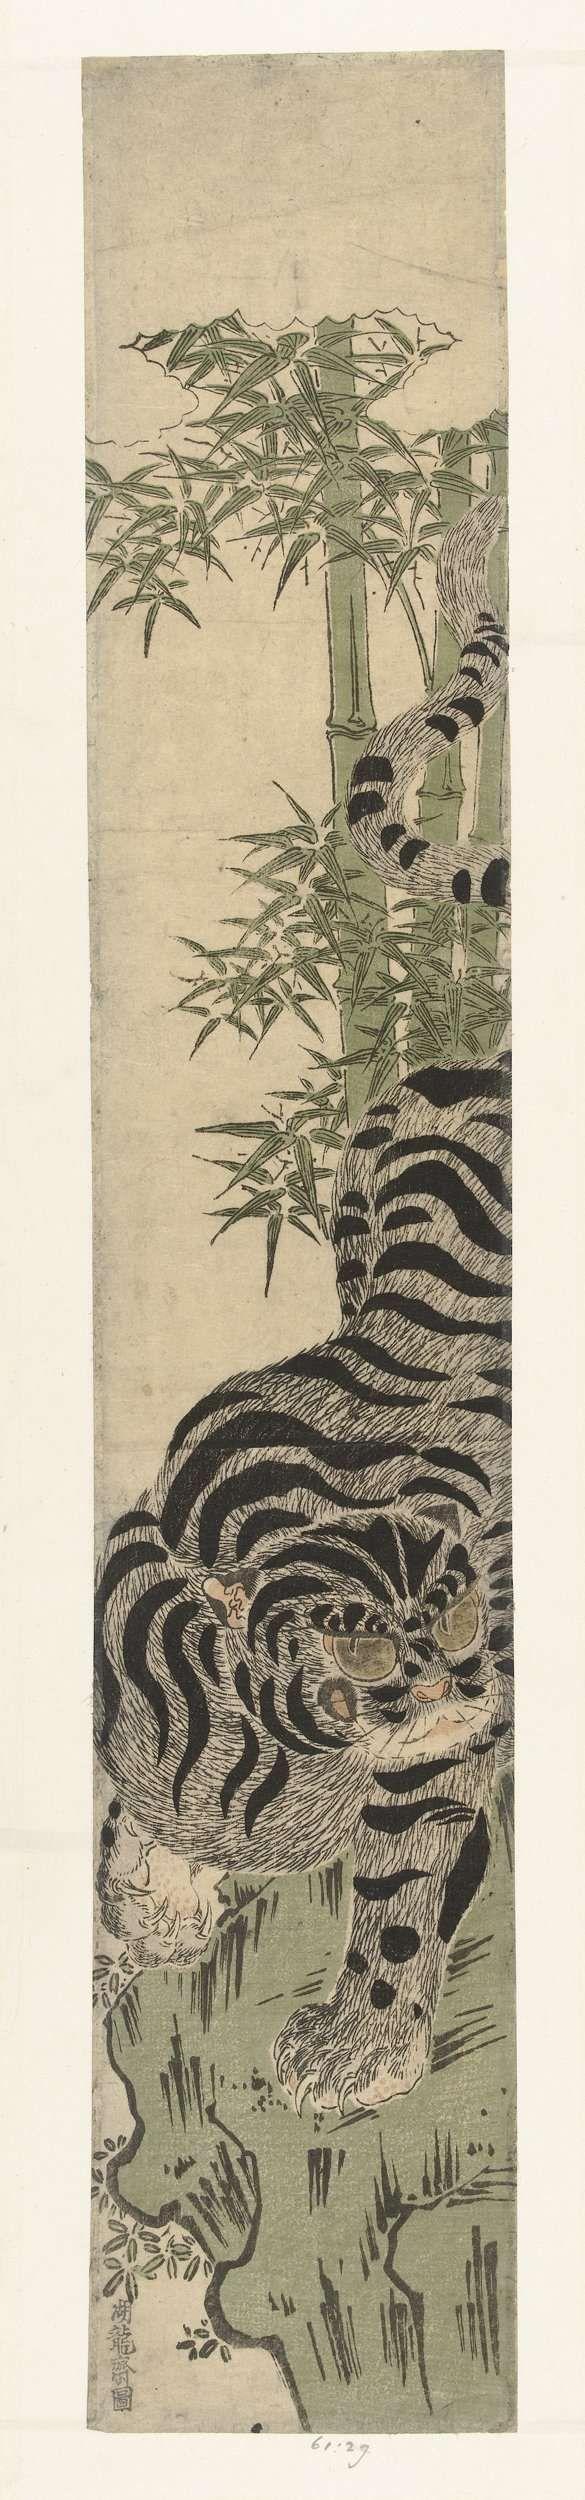 Tijger op rots bij bamboe, Isoda Koryusai, 1778 - 1780